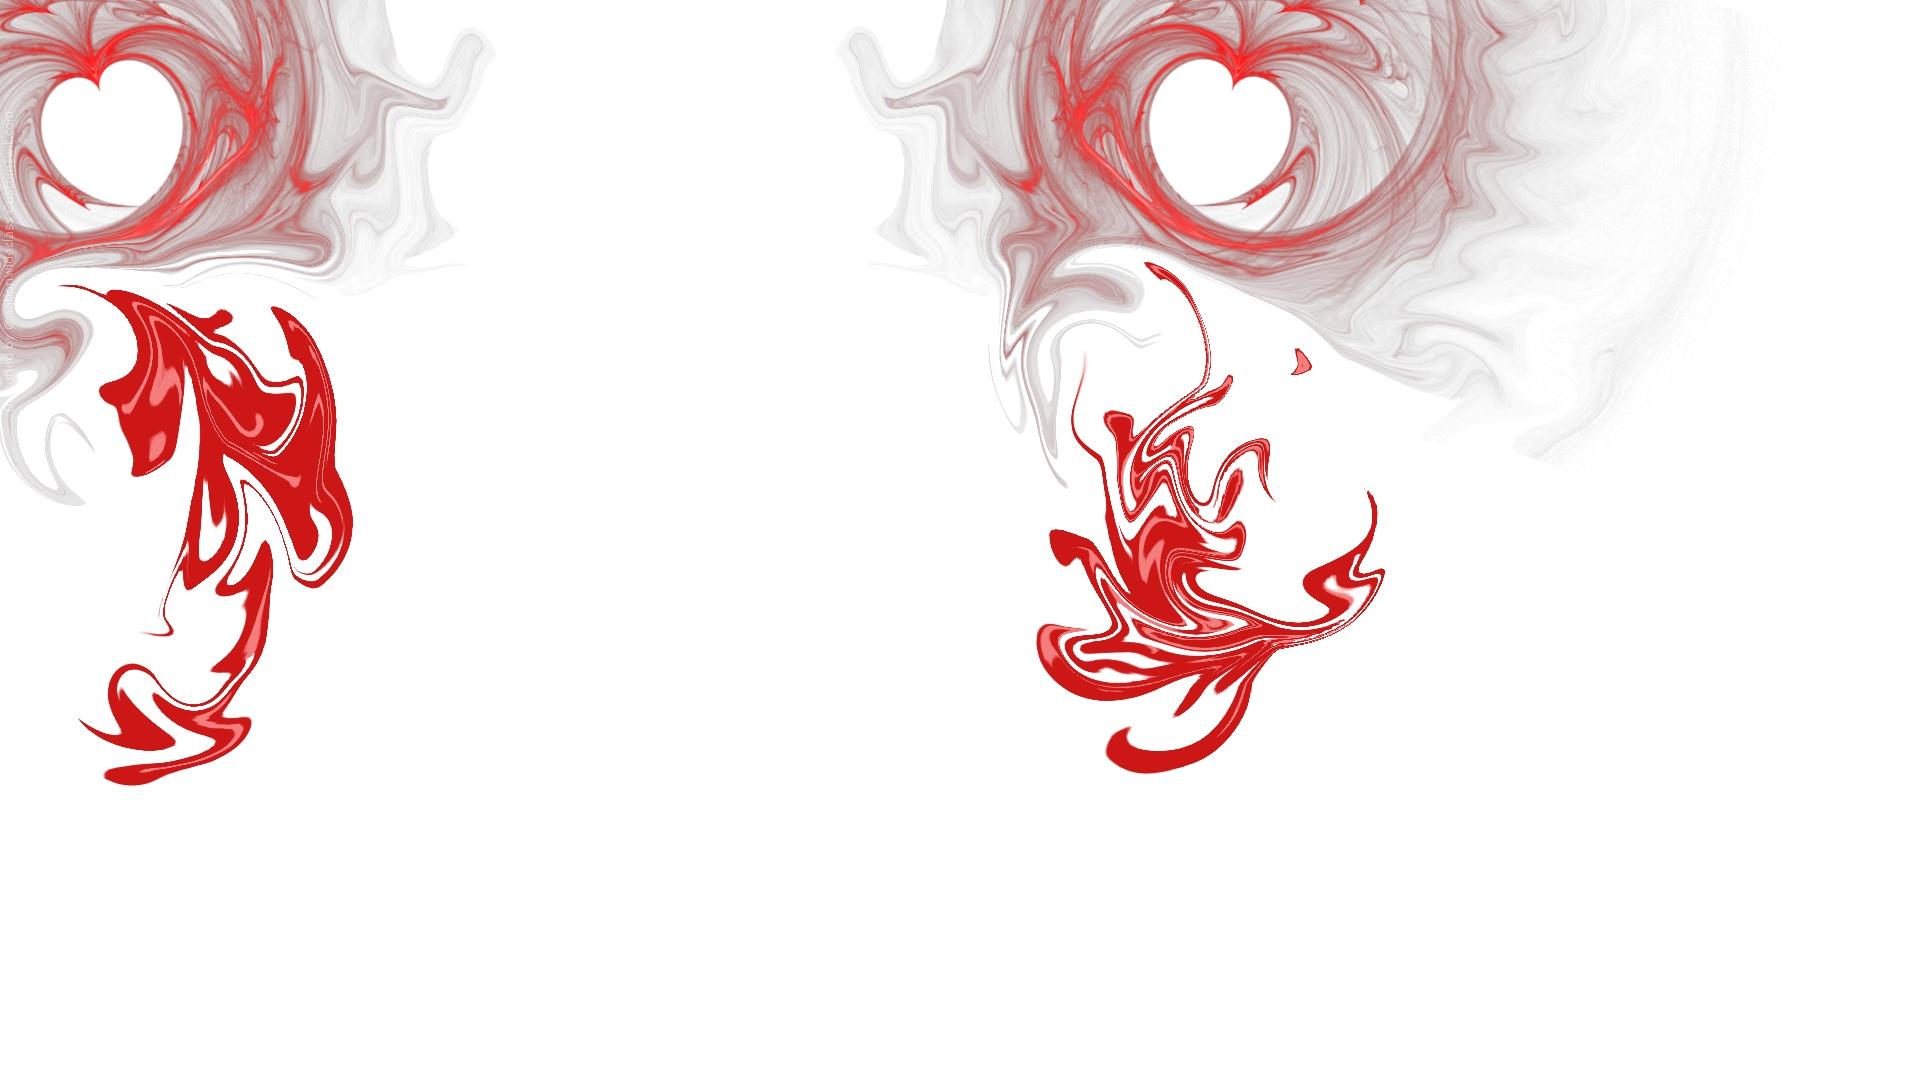 Twitter Background Valentines Day CustomTwitcom 1920x1080